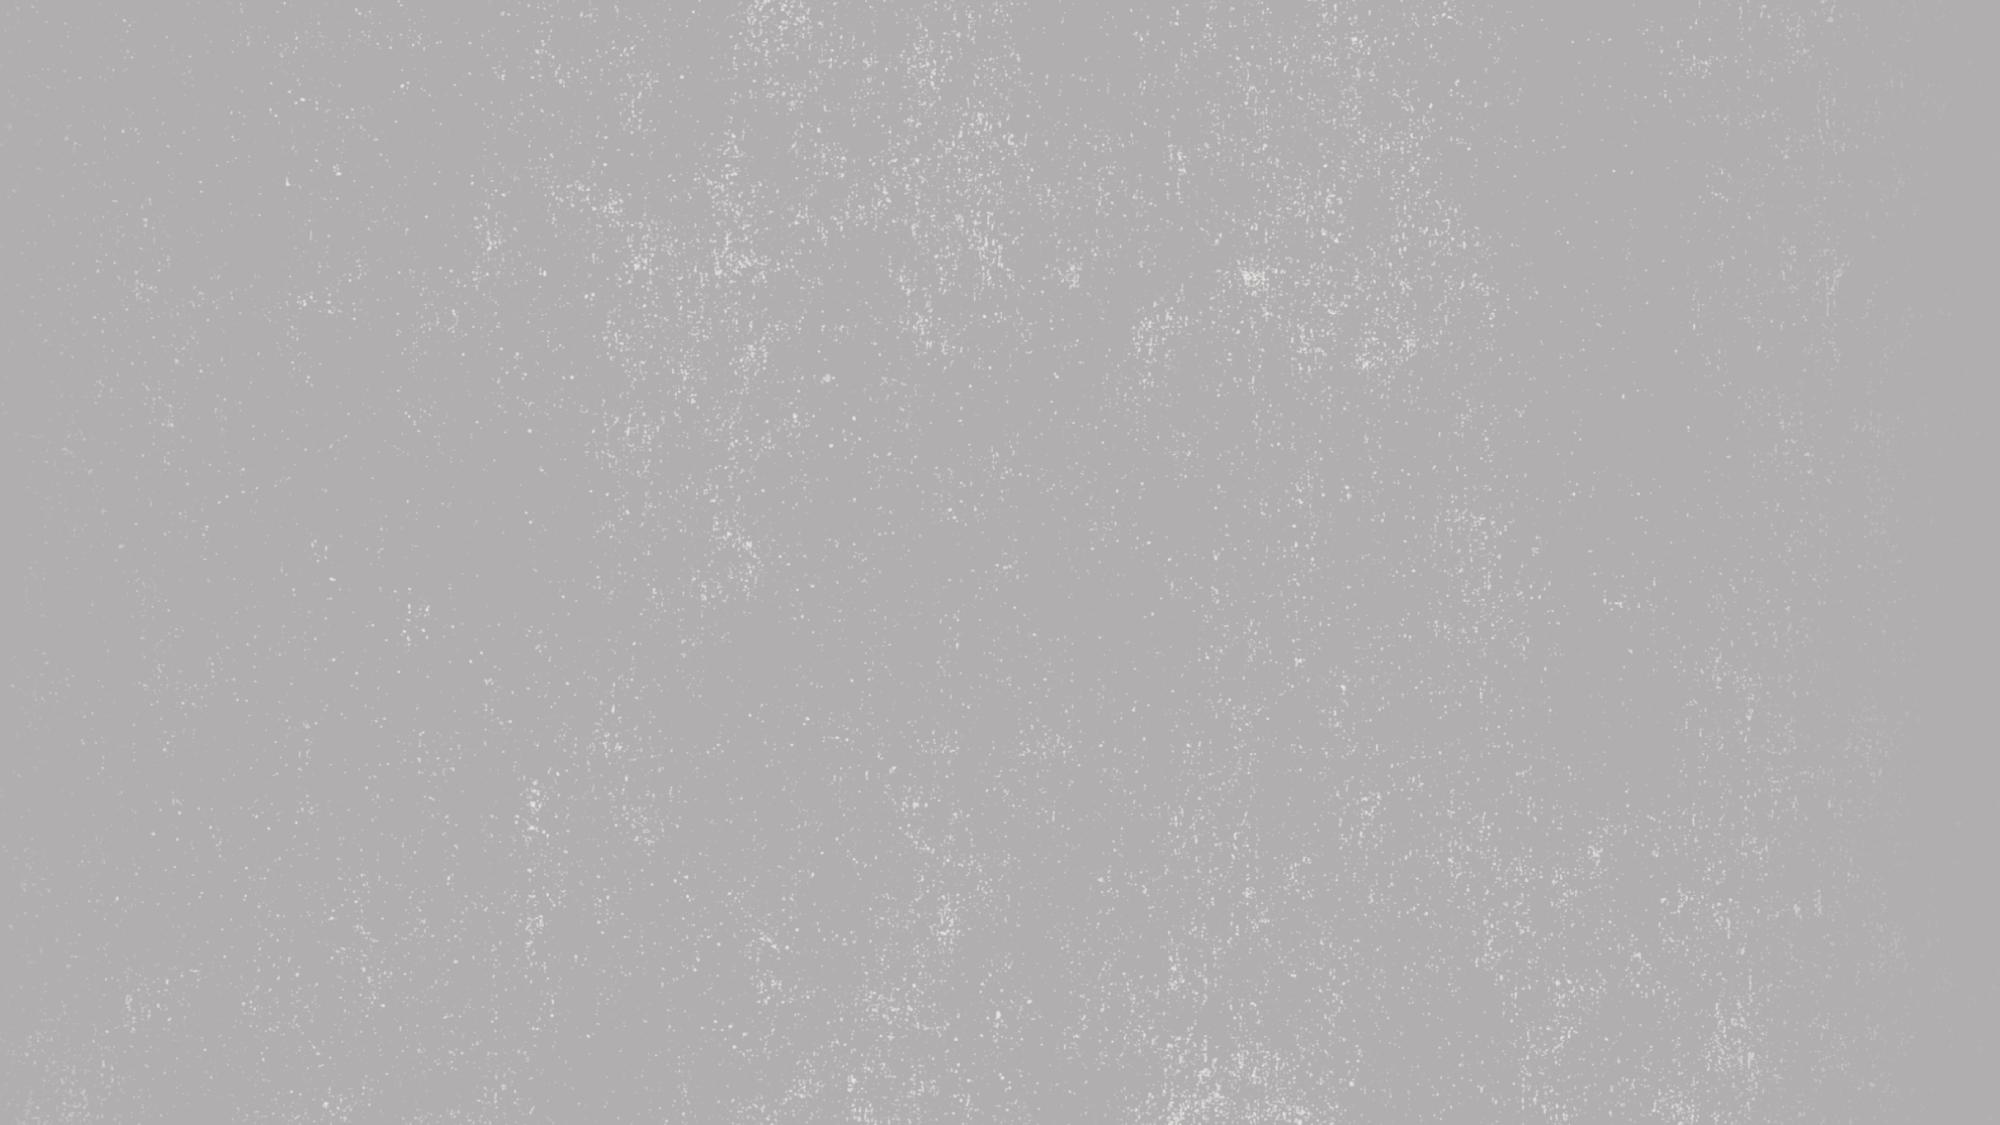 banner-Planetario-club-de-lectura---cosmo-relatos-fondo.png